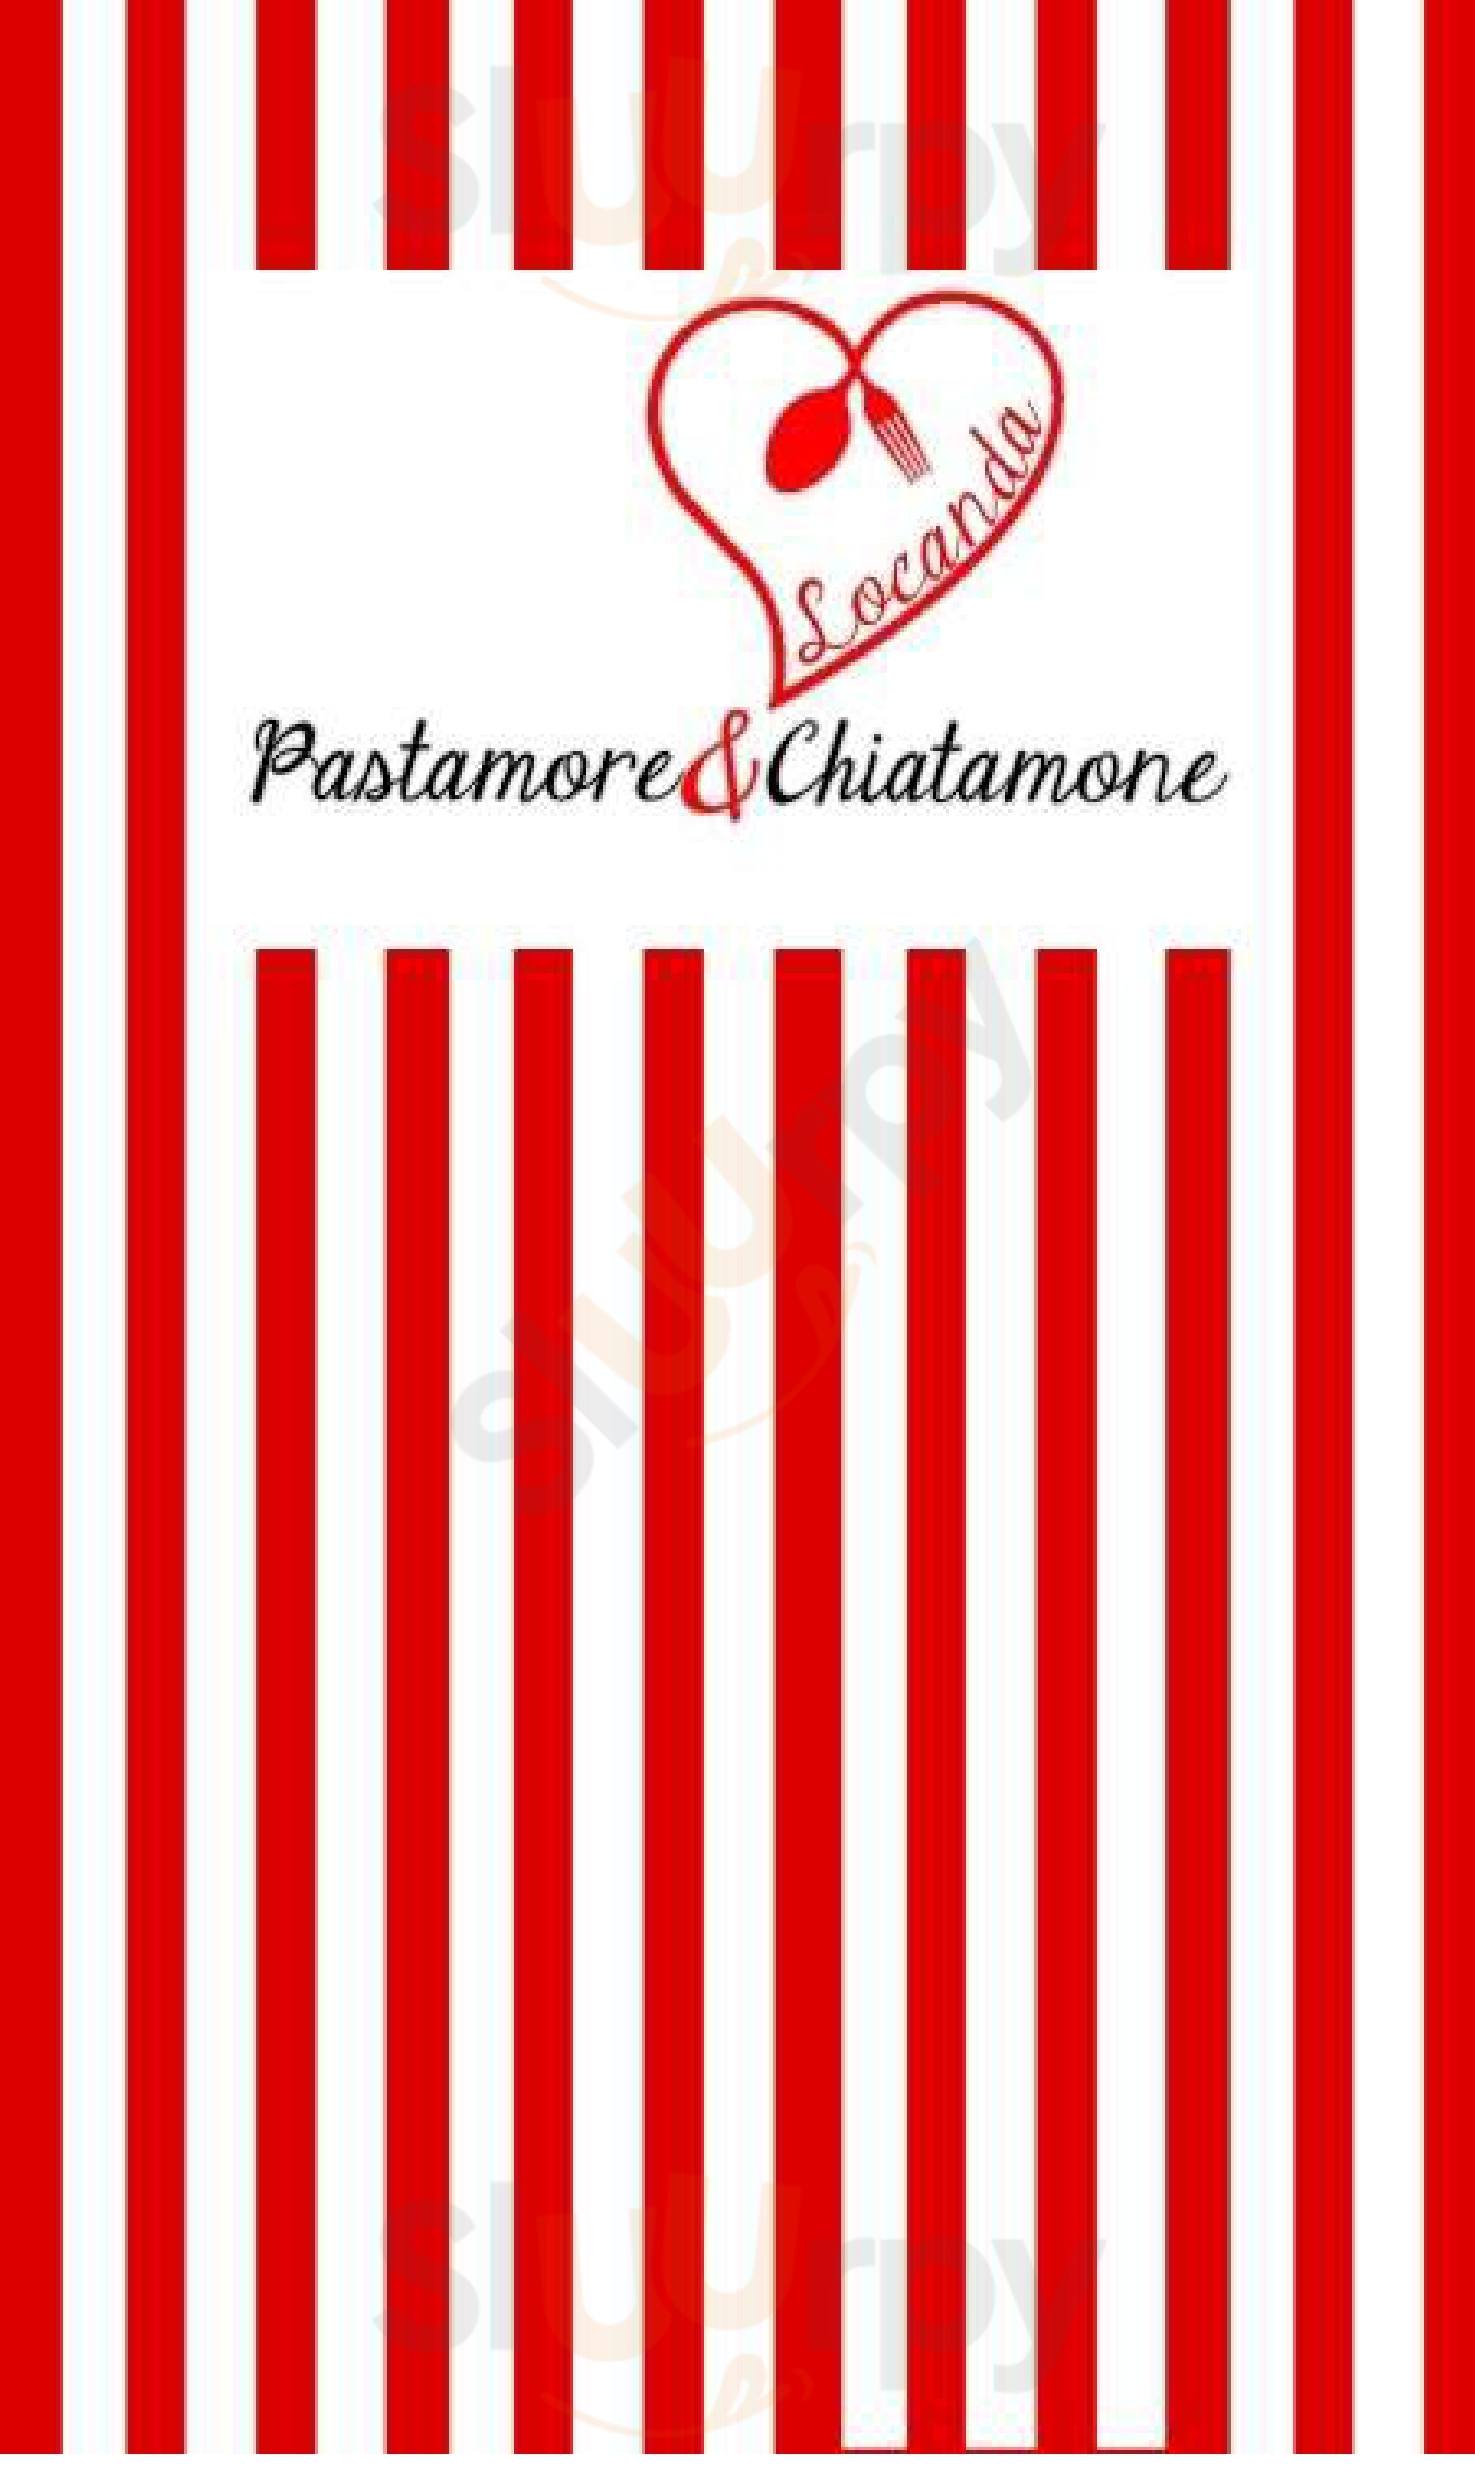 Pastamore&Chiatamone Napoli menù 1 pagina